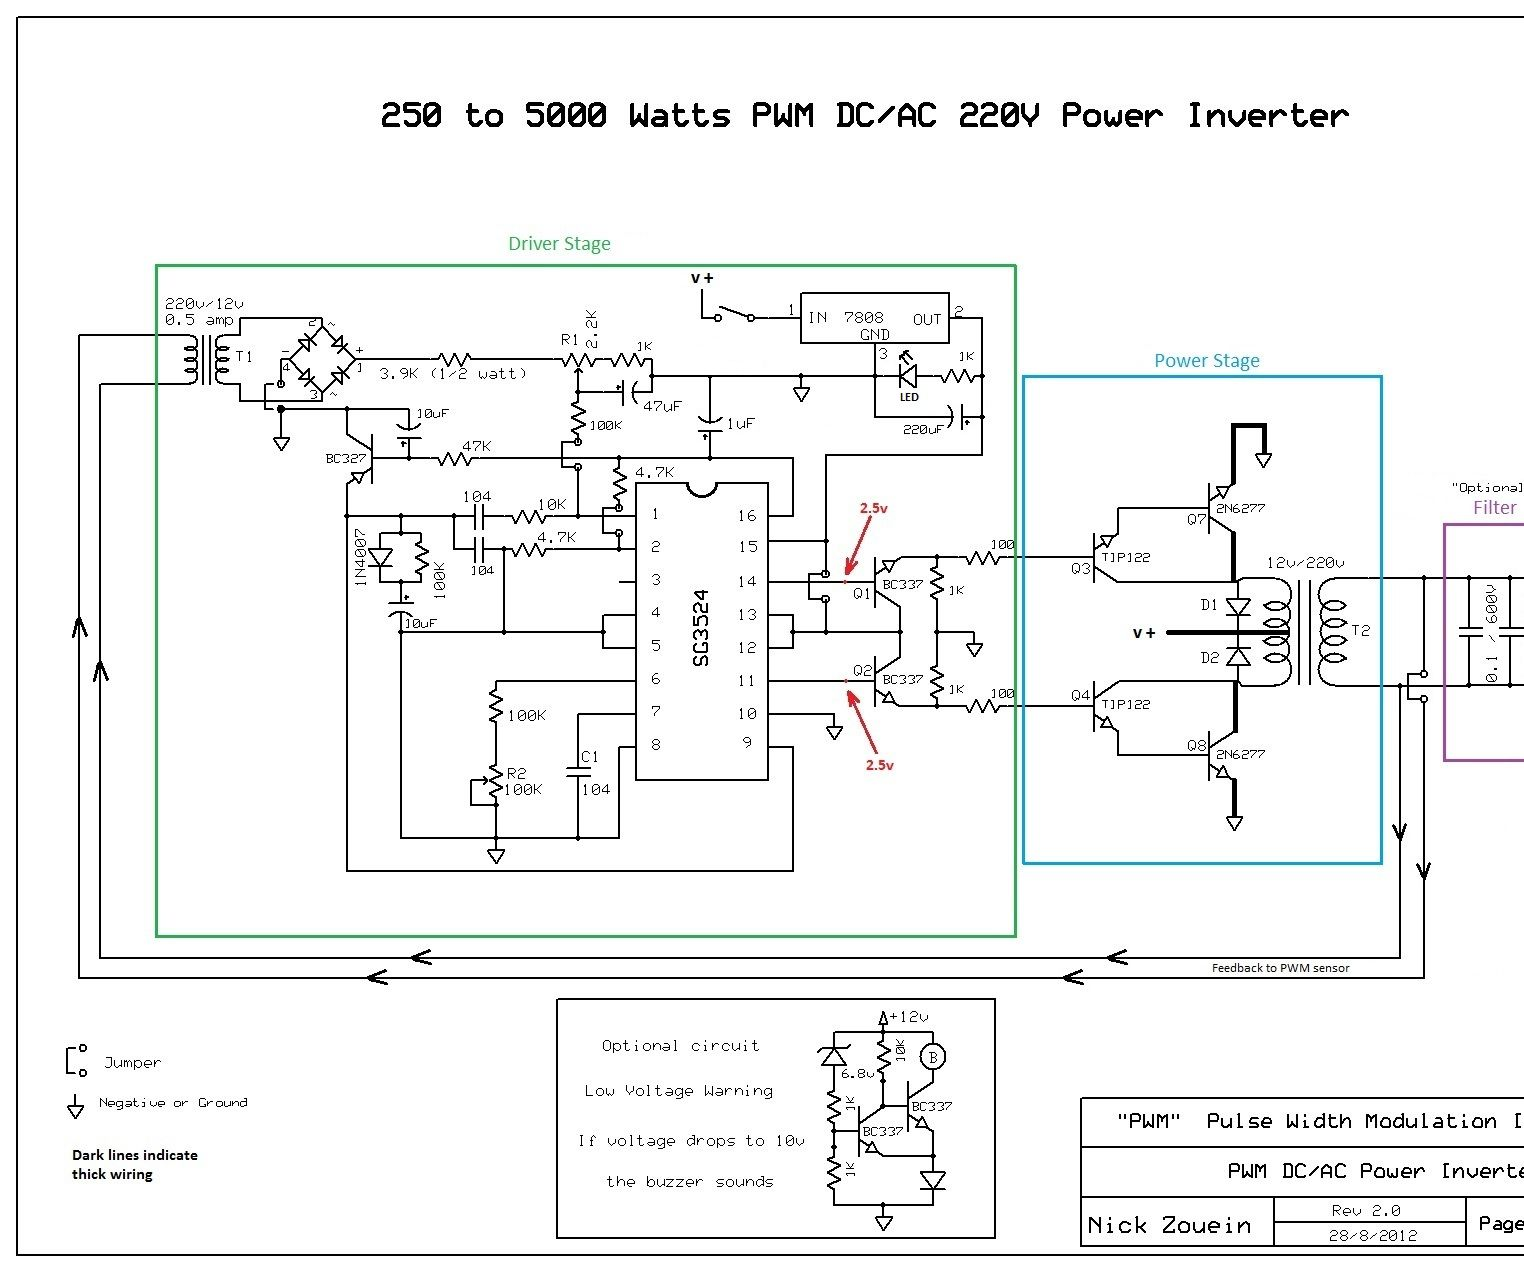 icom ic a200 wiring diagram wiring libraryicom ic a200 wiring diagram 14 [ 1524 x 1270 Pixel ]